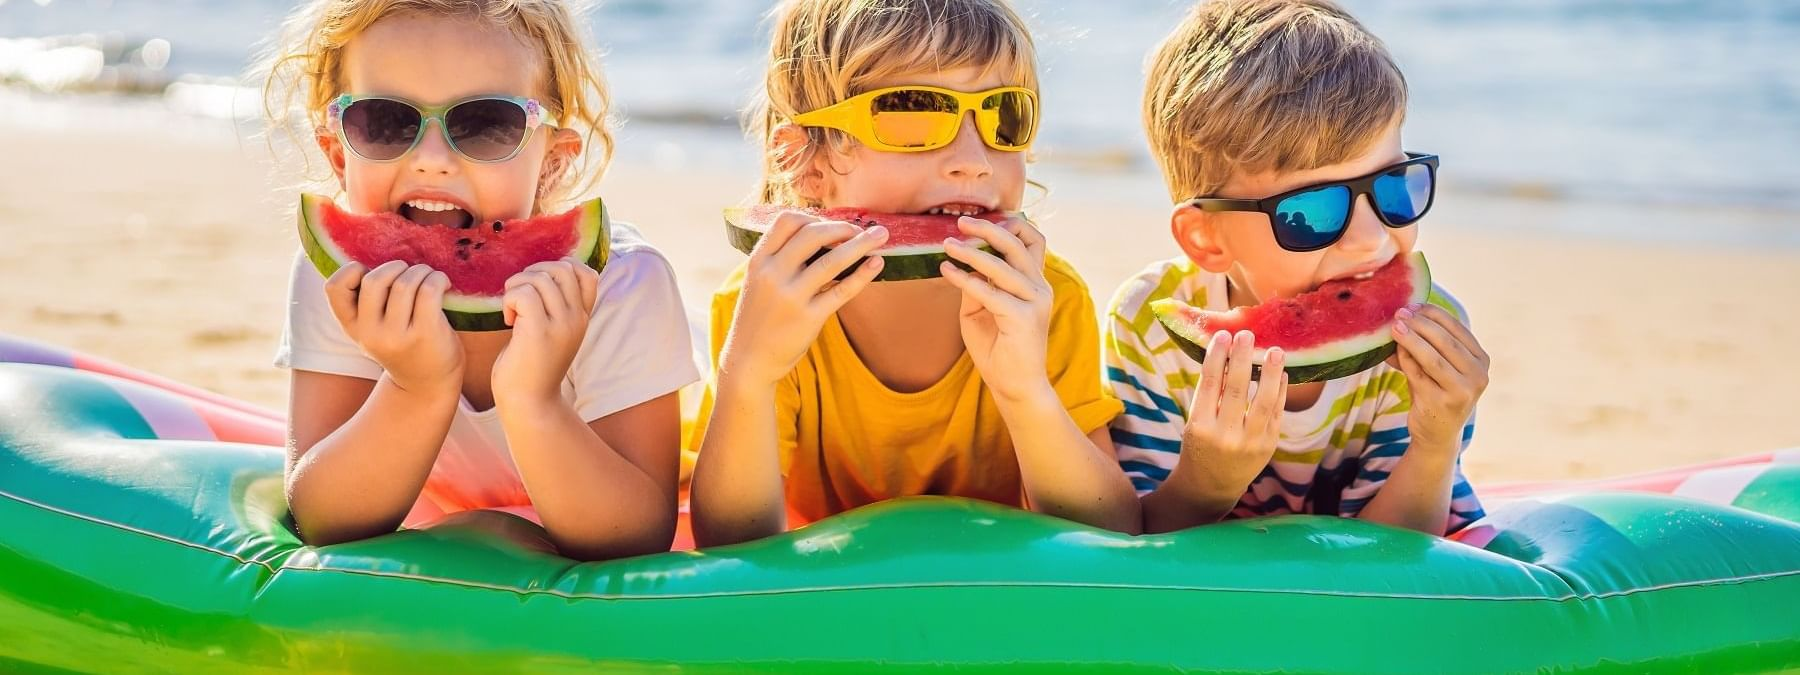 Kids eating watermelon on beach at Daydream Island Resort